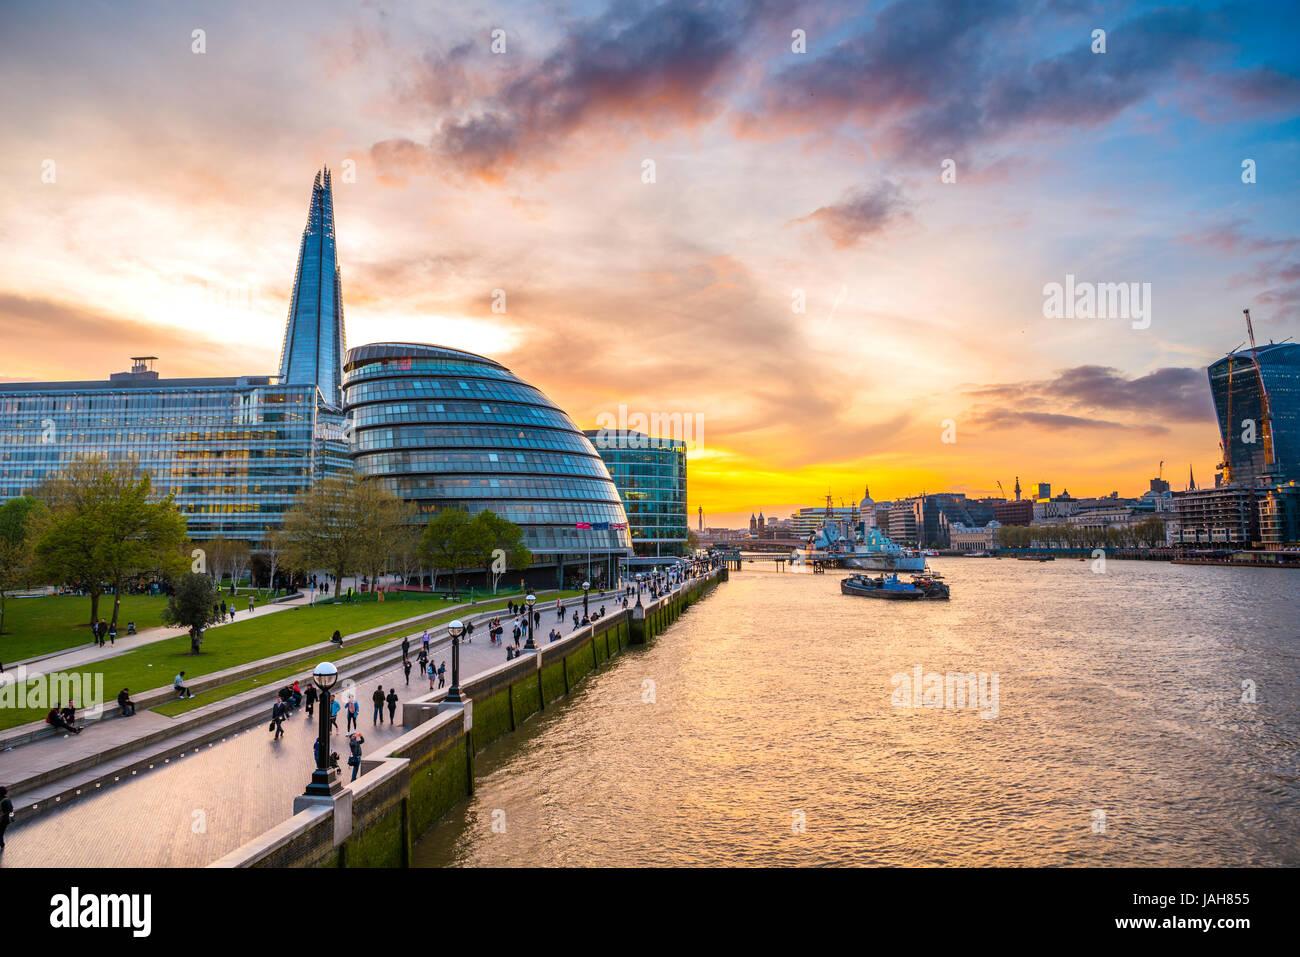 Riverside promenade sul Tamigi, Potters Fields Park, Skyline, London City Hall, Shard, al tramonto, Southwark, Londra Immagini Stock